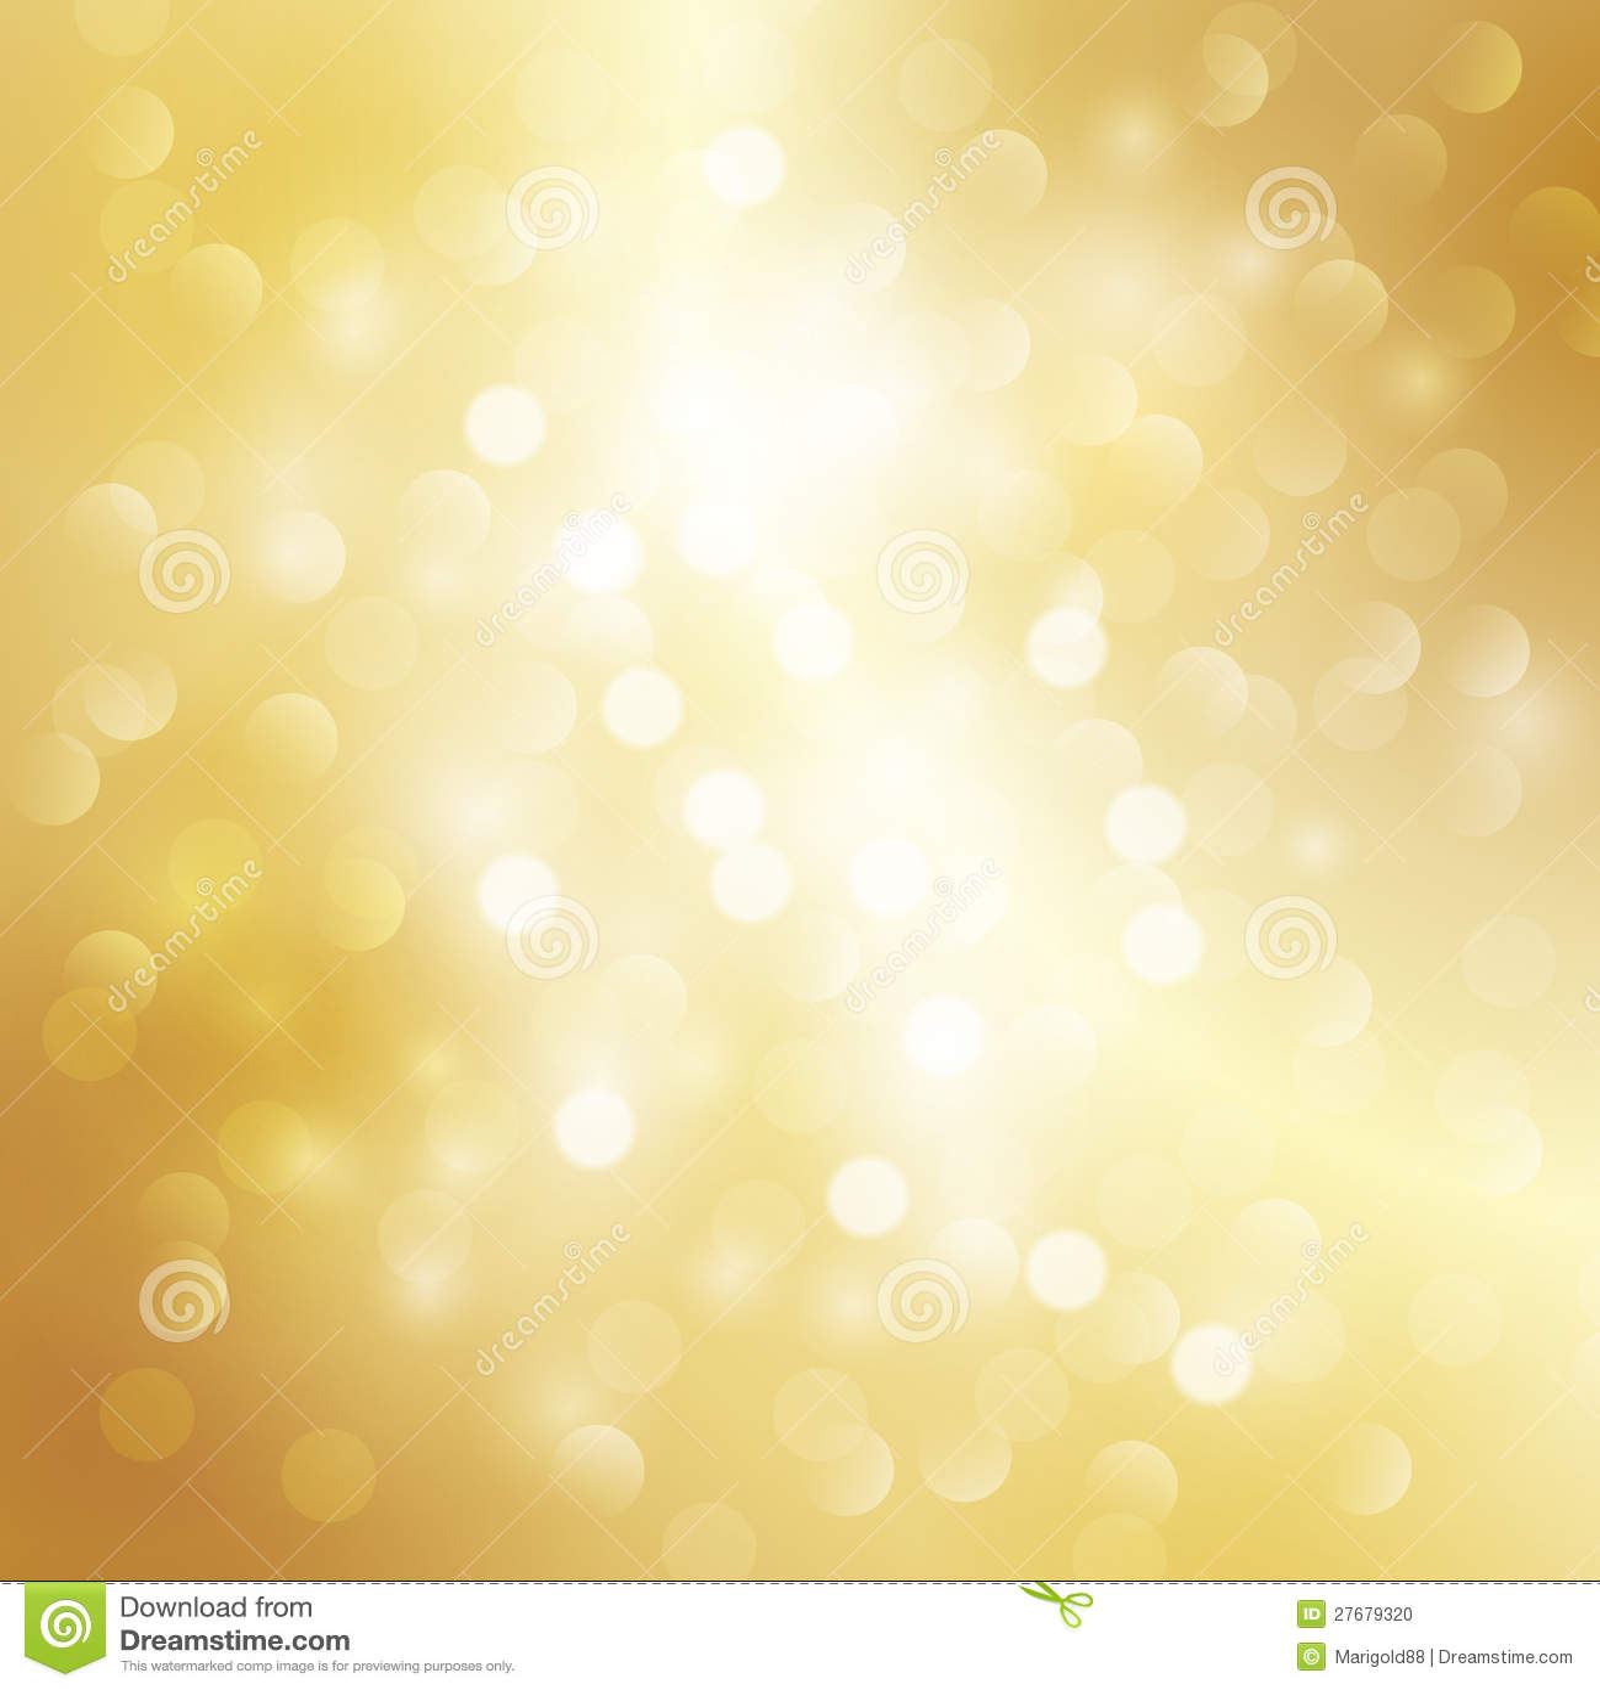 Gold Light Background Stock Photo - Image: 27679320  Gold Light Back...